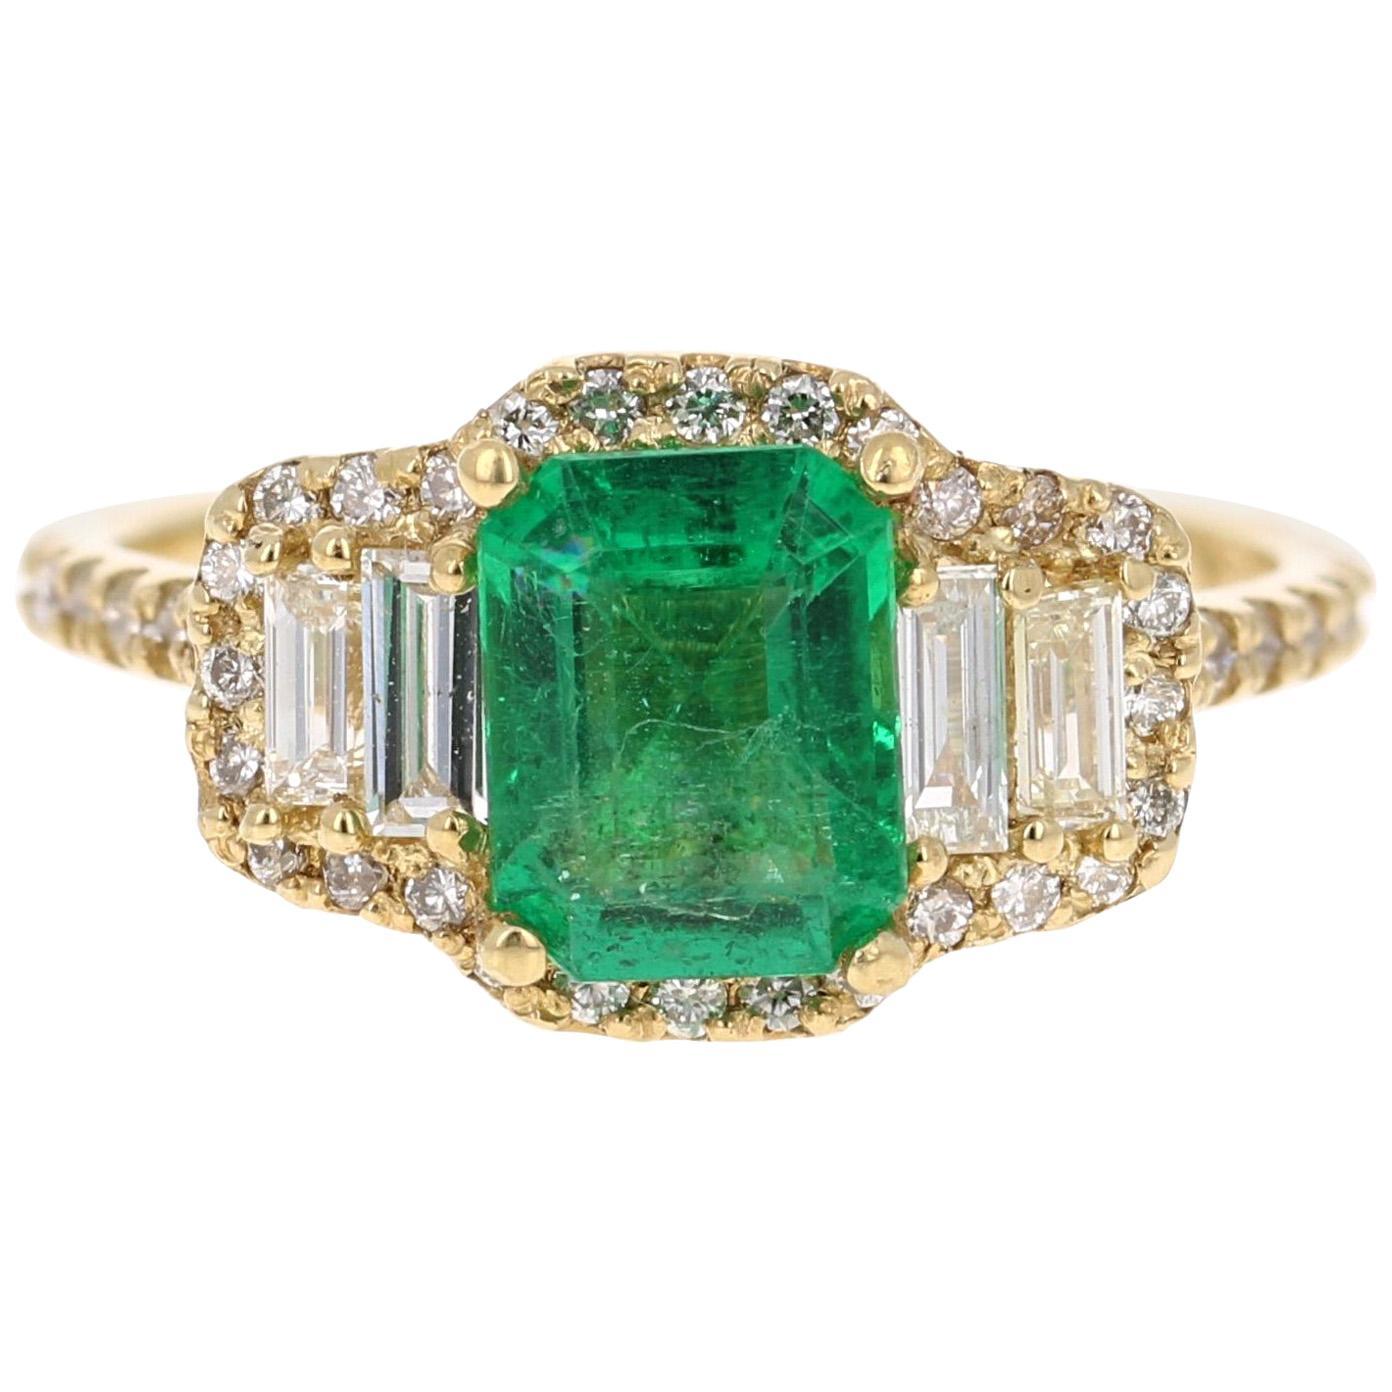 2.30 Carat Emerald Diamond 14 Karat Yellow Gold Three-Stone Ring GIA Certified